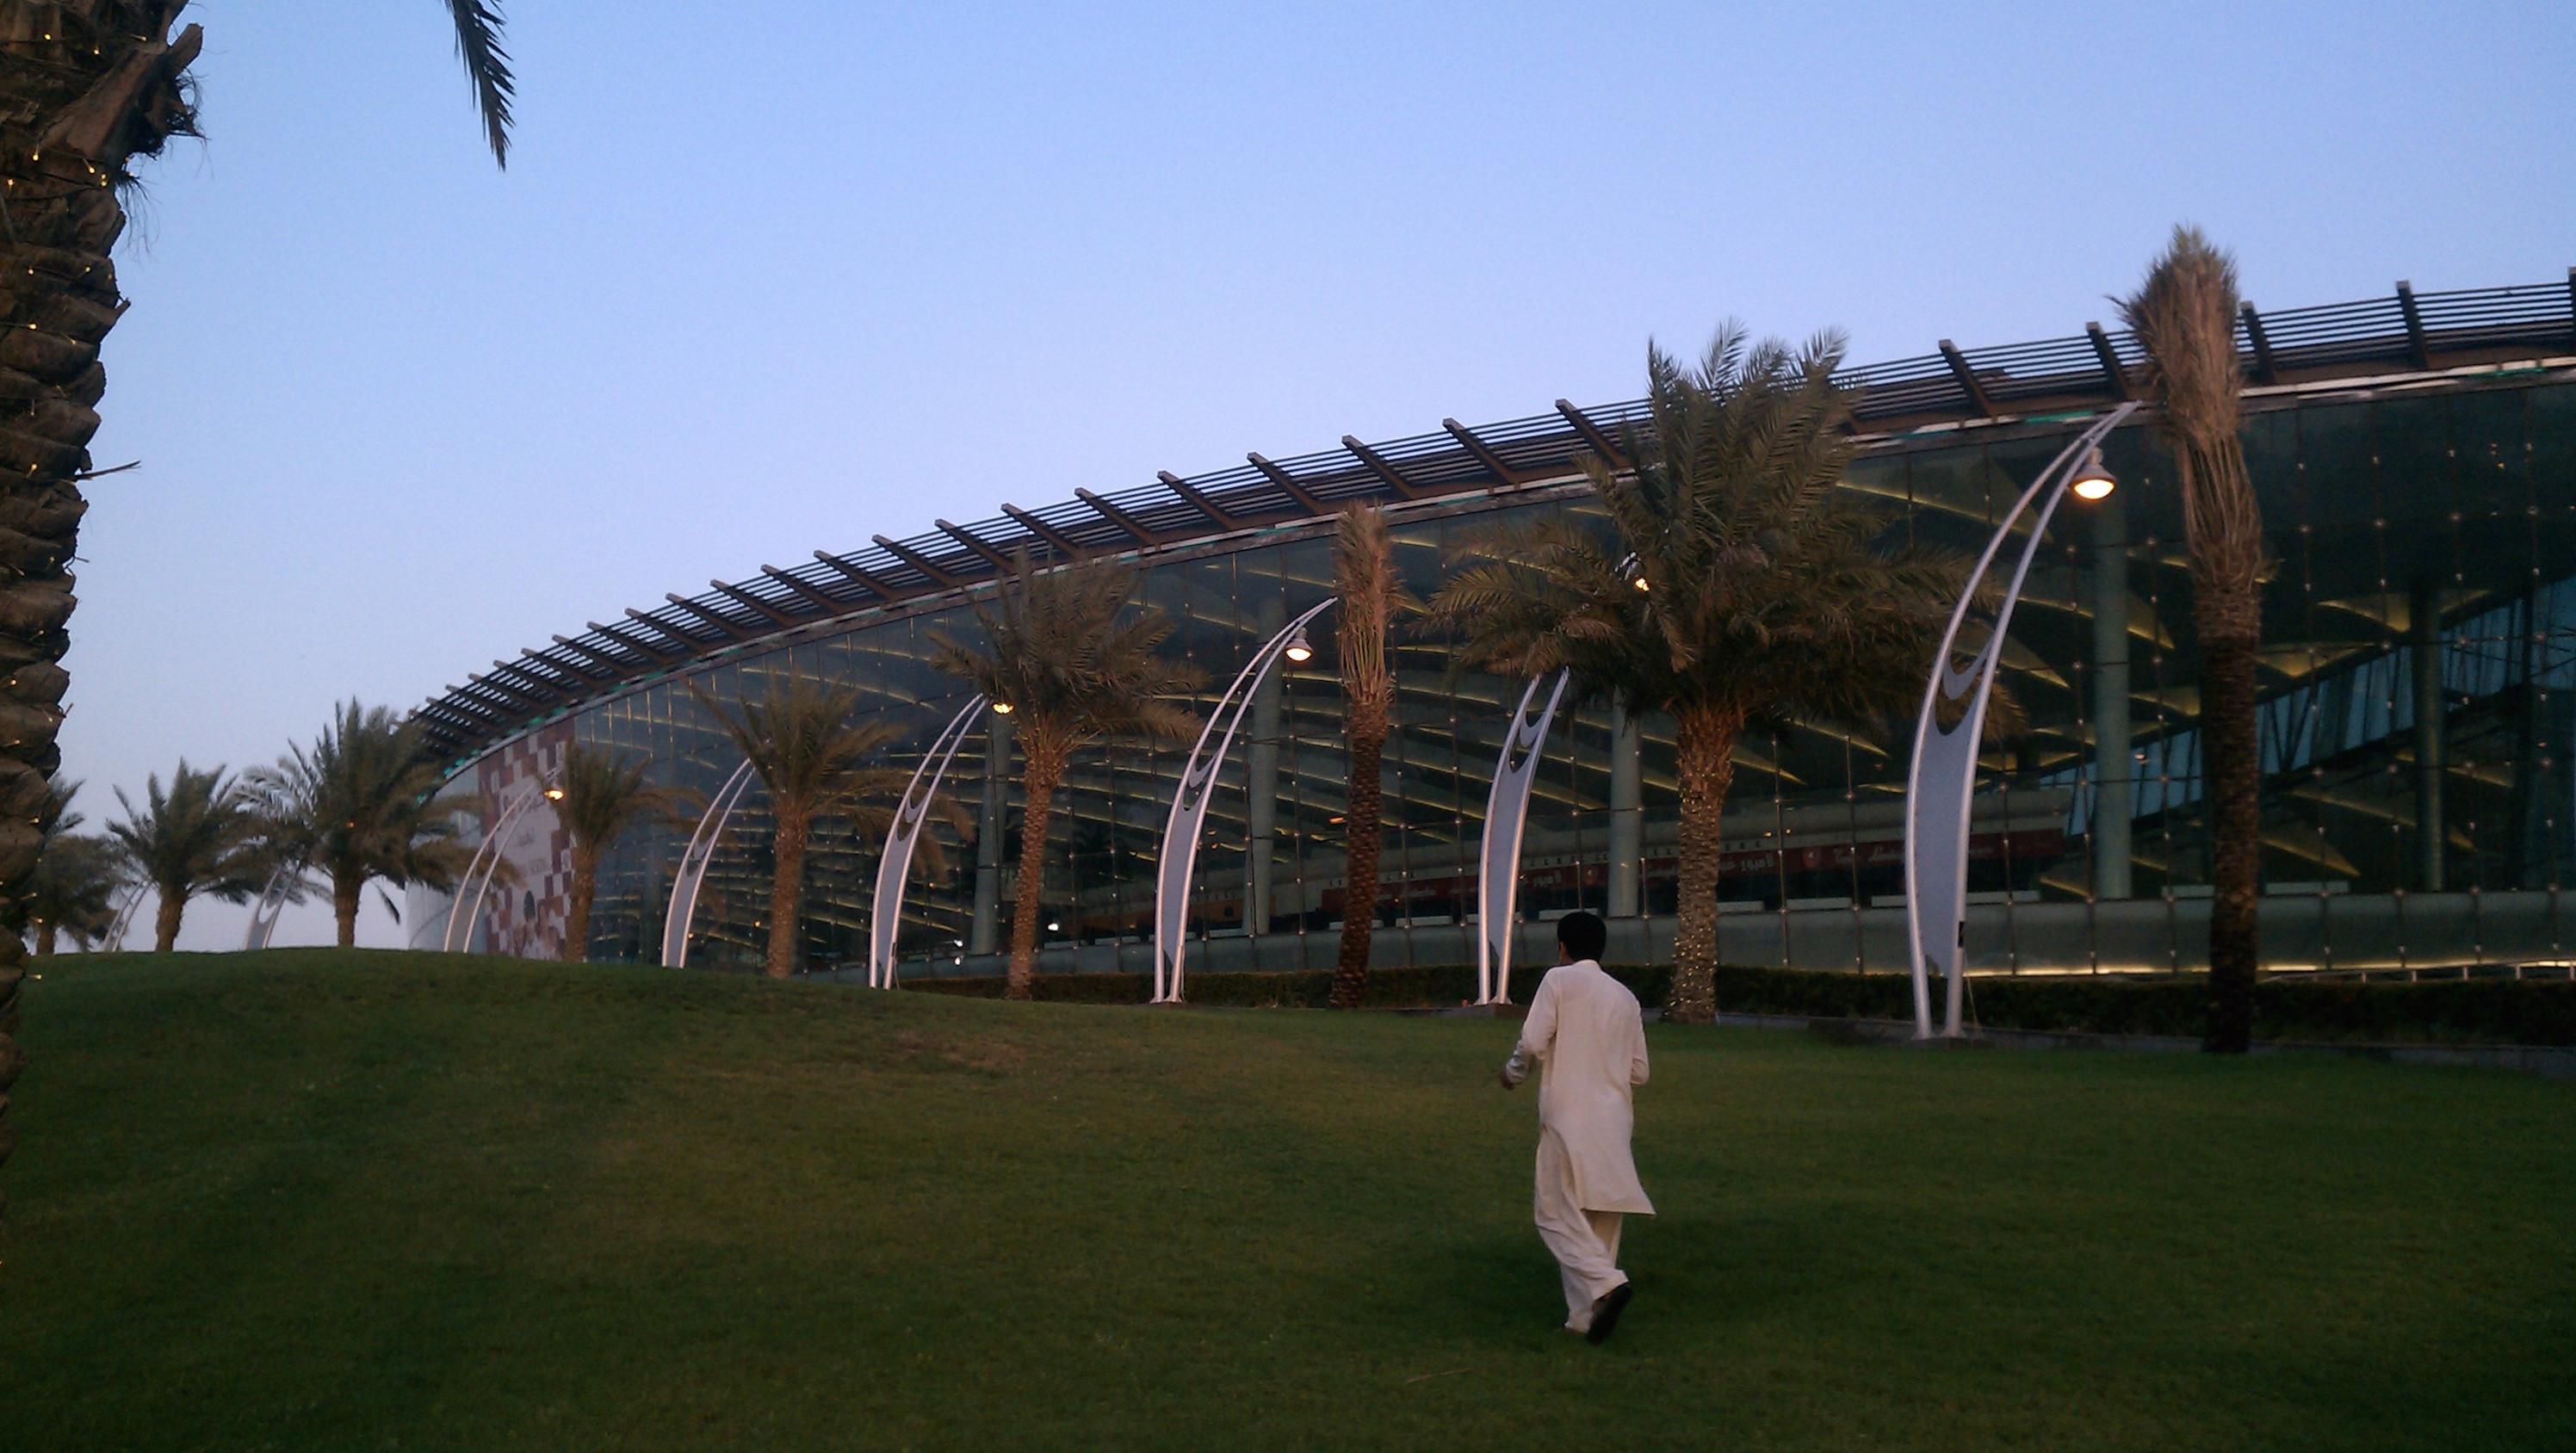 A man walks in front of the Mall of Arabia in Jeddah, Saudi Arabia.